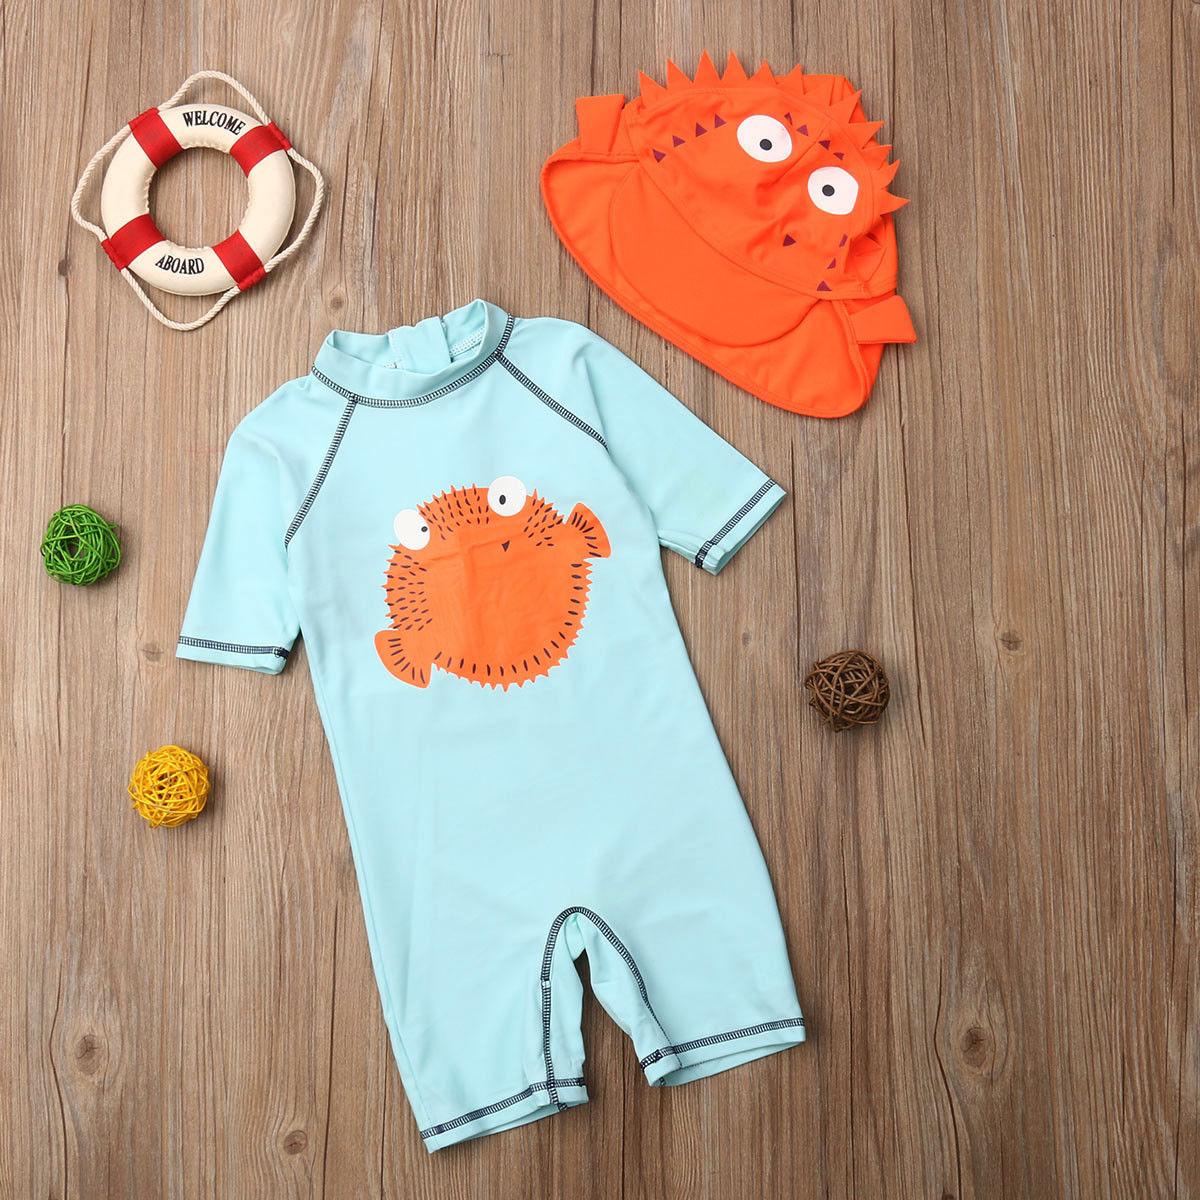 2019 Brand New 1-6Y Toddler Kids Baby Girls Boys Puffer Print Swimwear +Hats 2PCS Long Sleeve Swimsuit Sun Block Bathing Suit